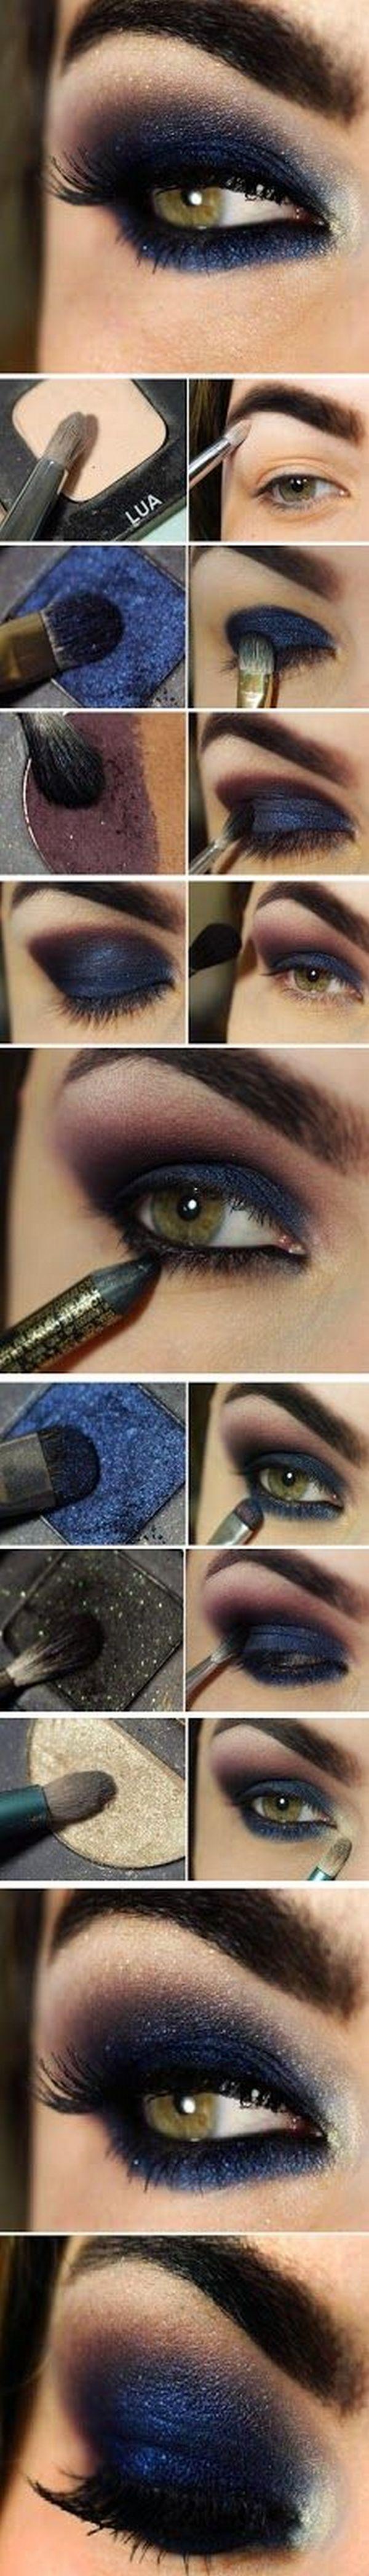 Макияж глаз с нависшим веком 18